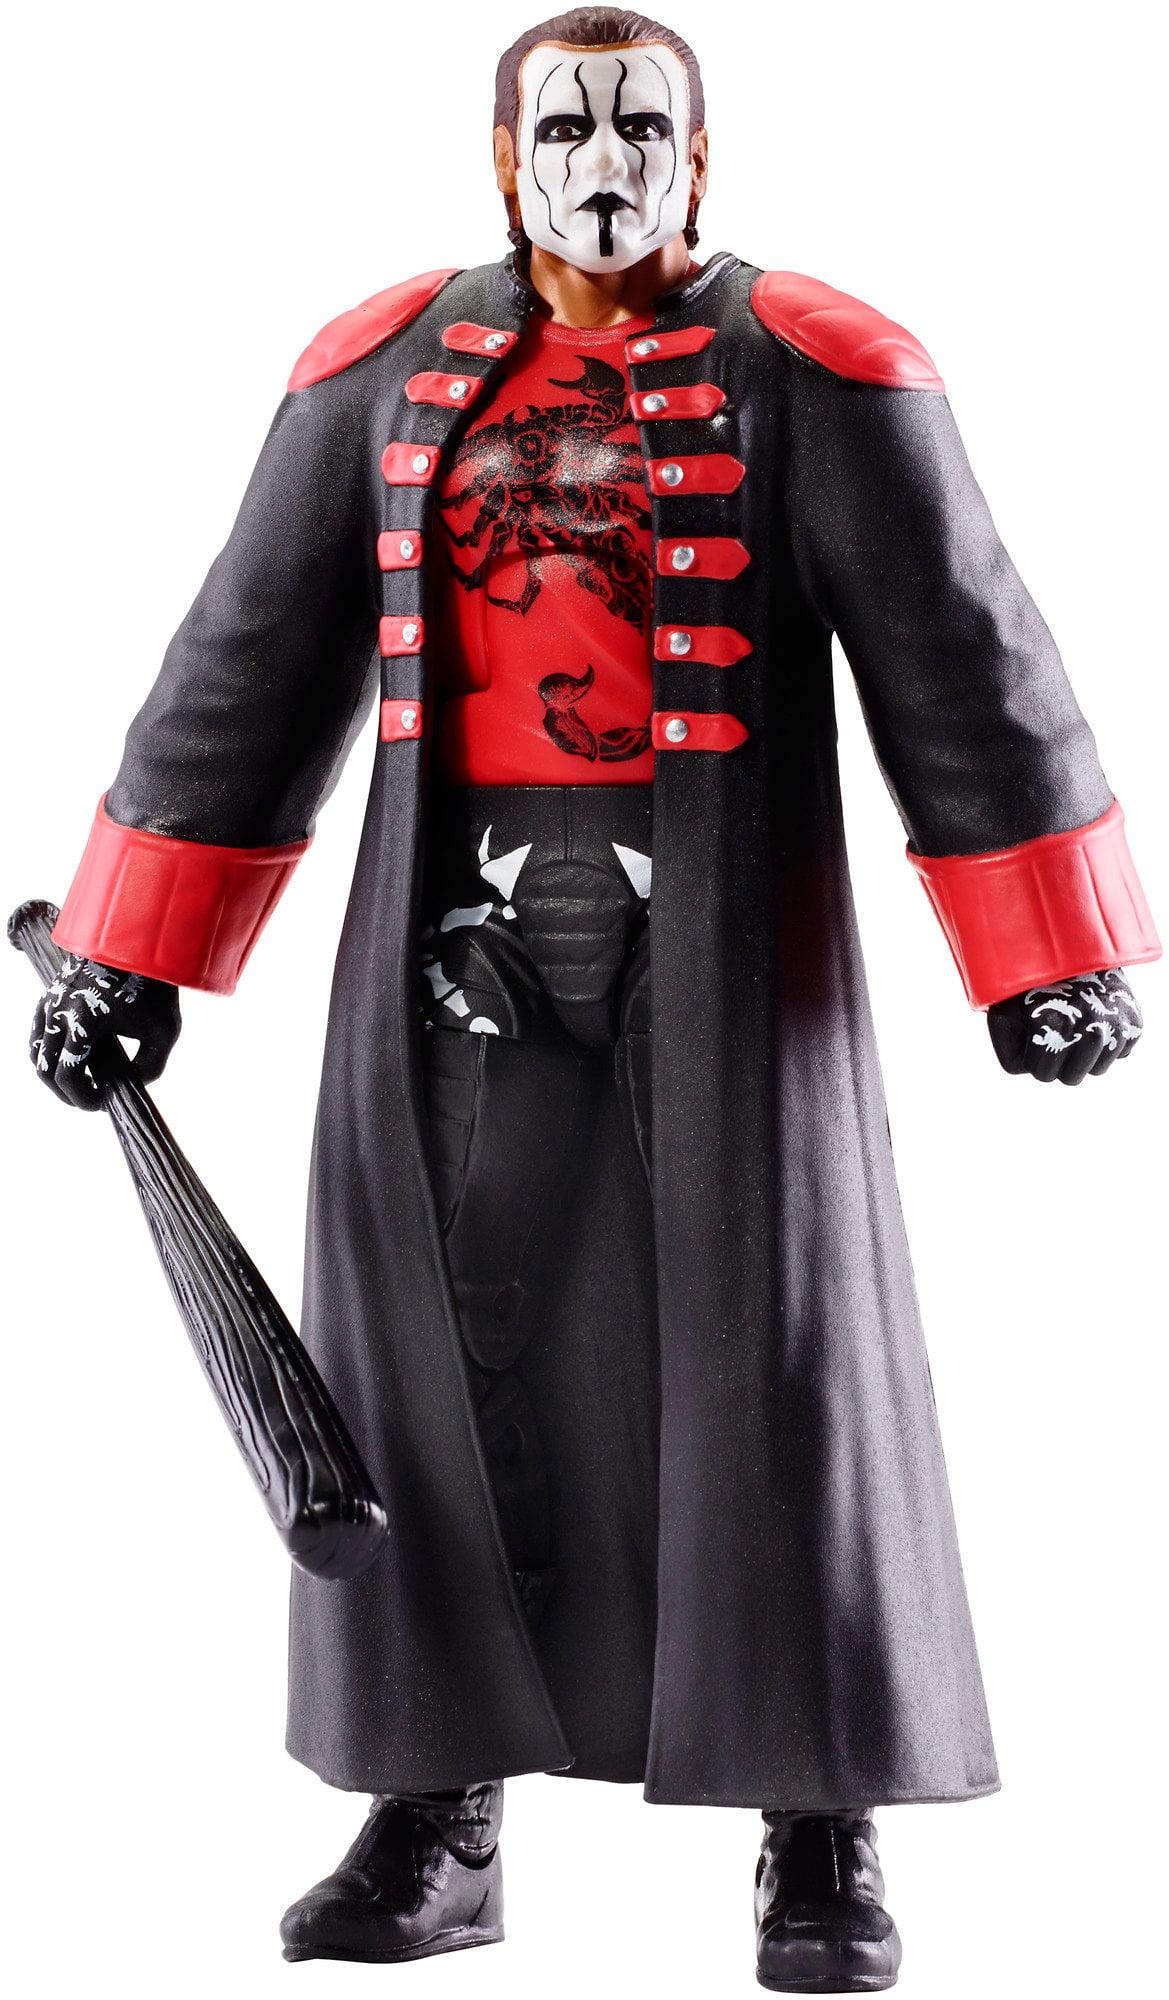 WWE Elite Sting Action Figure by Mattel